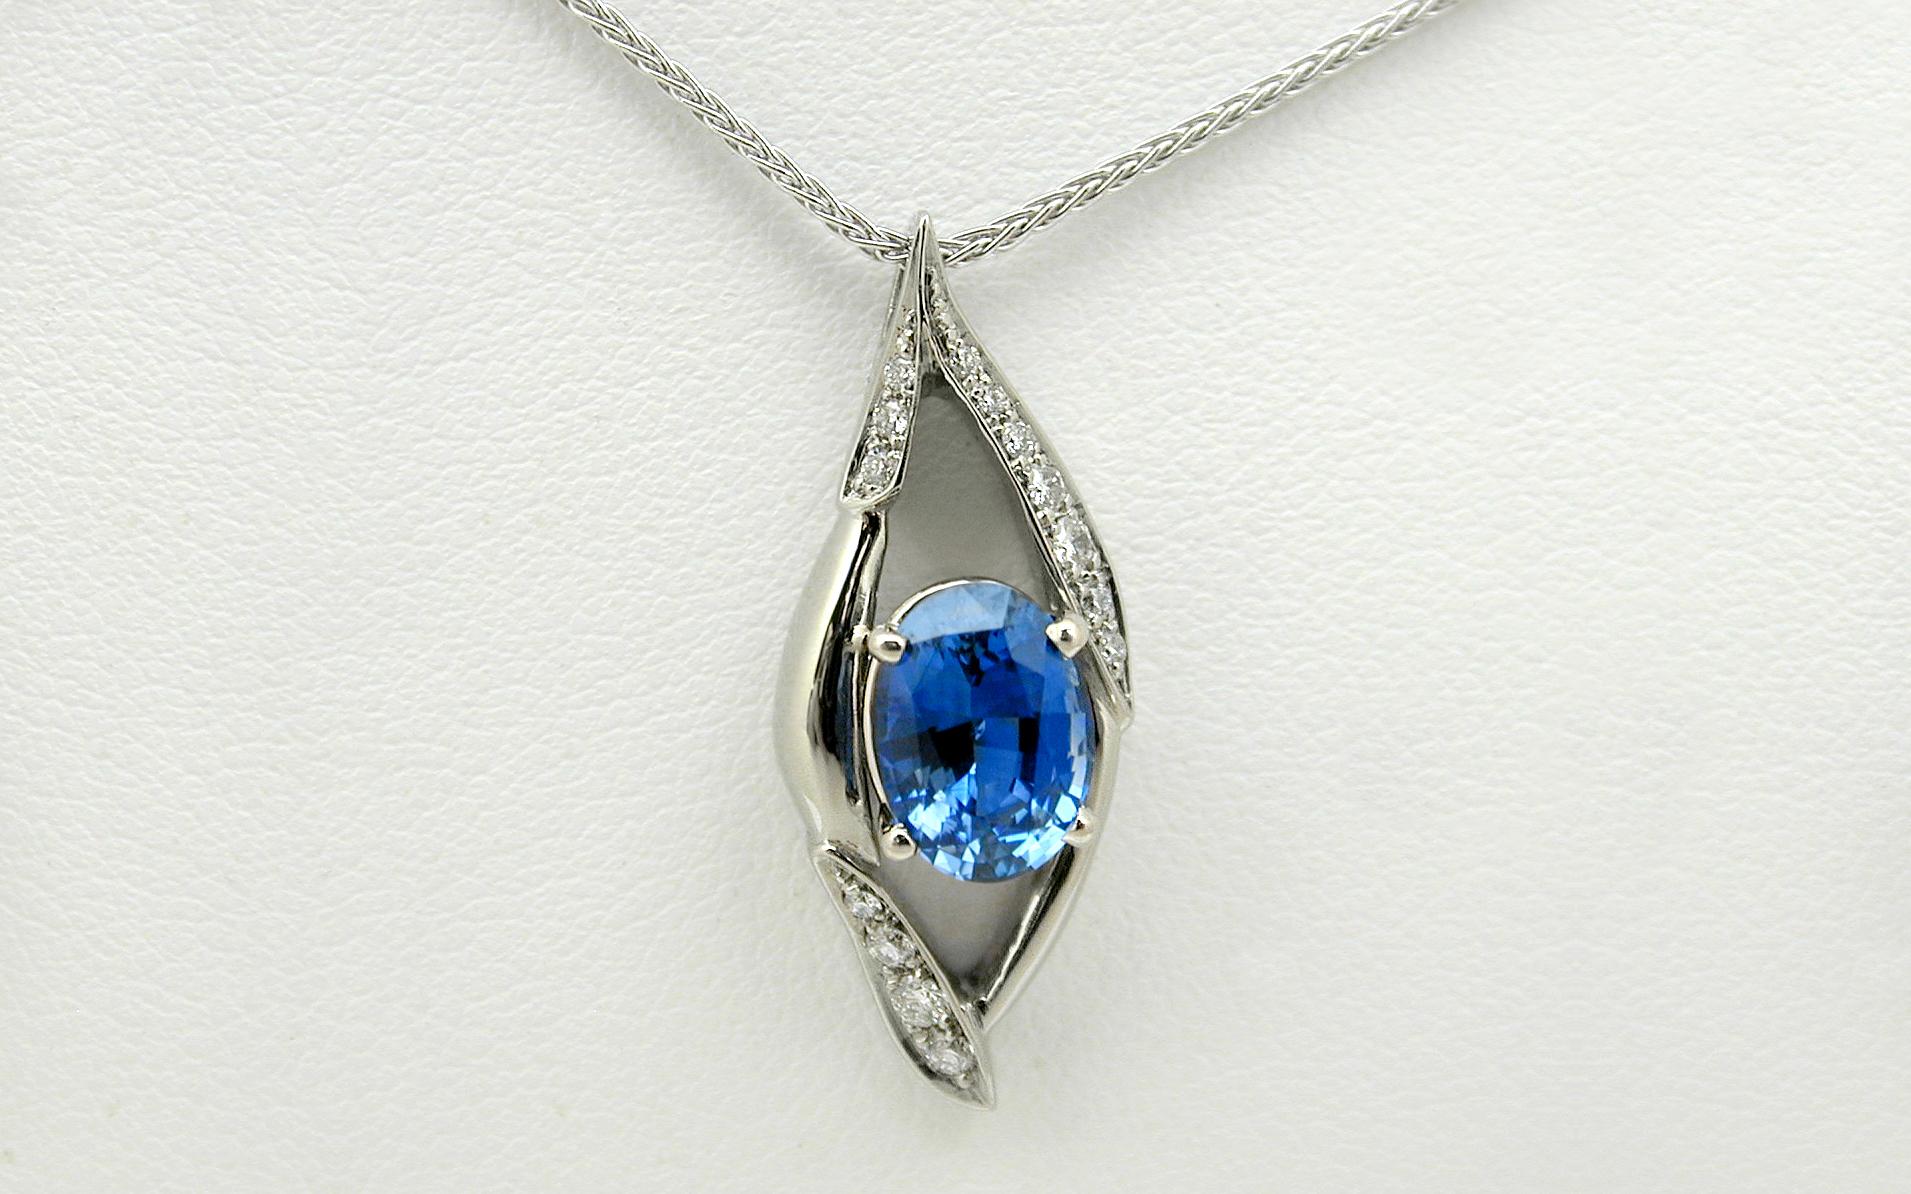 2.16 carat Oval Sapphire & Bead Set Diamond